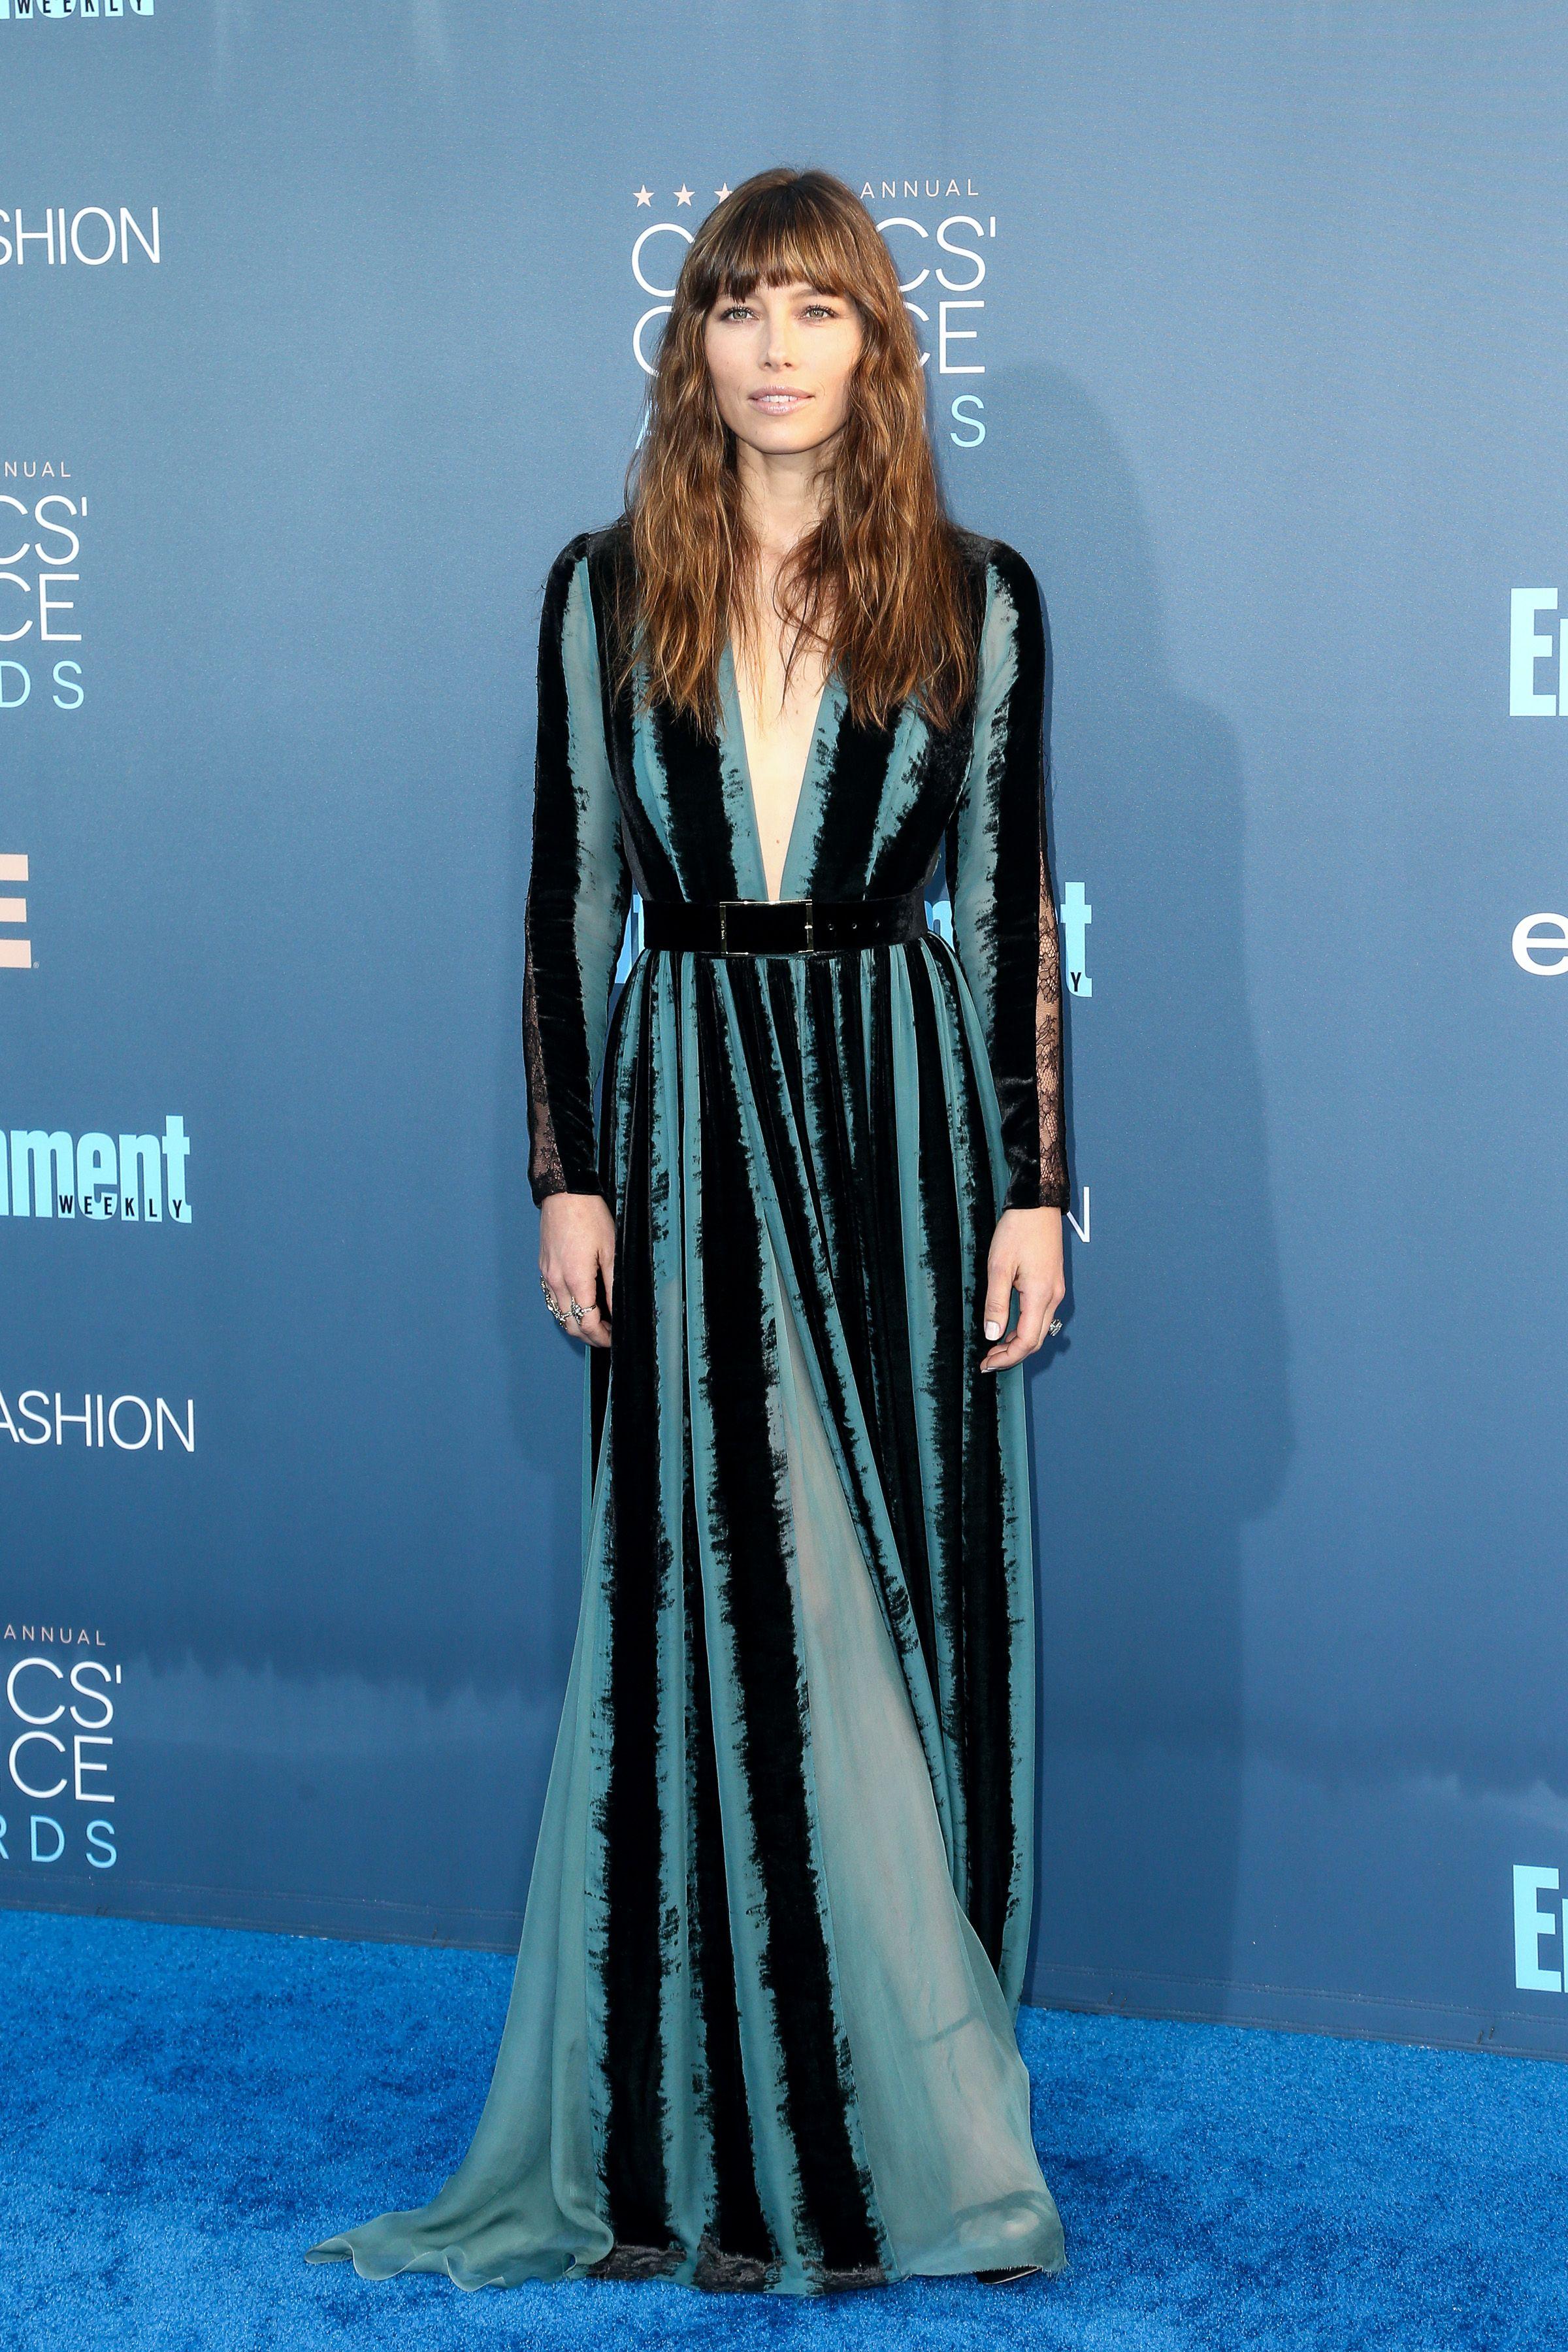 Jessica Biel at the 22nd Annual Critics' Choice Awards. Photo by John Salangsang/BFA/REX/Shutterstock